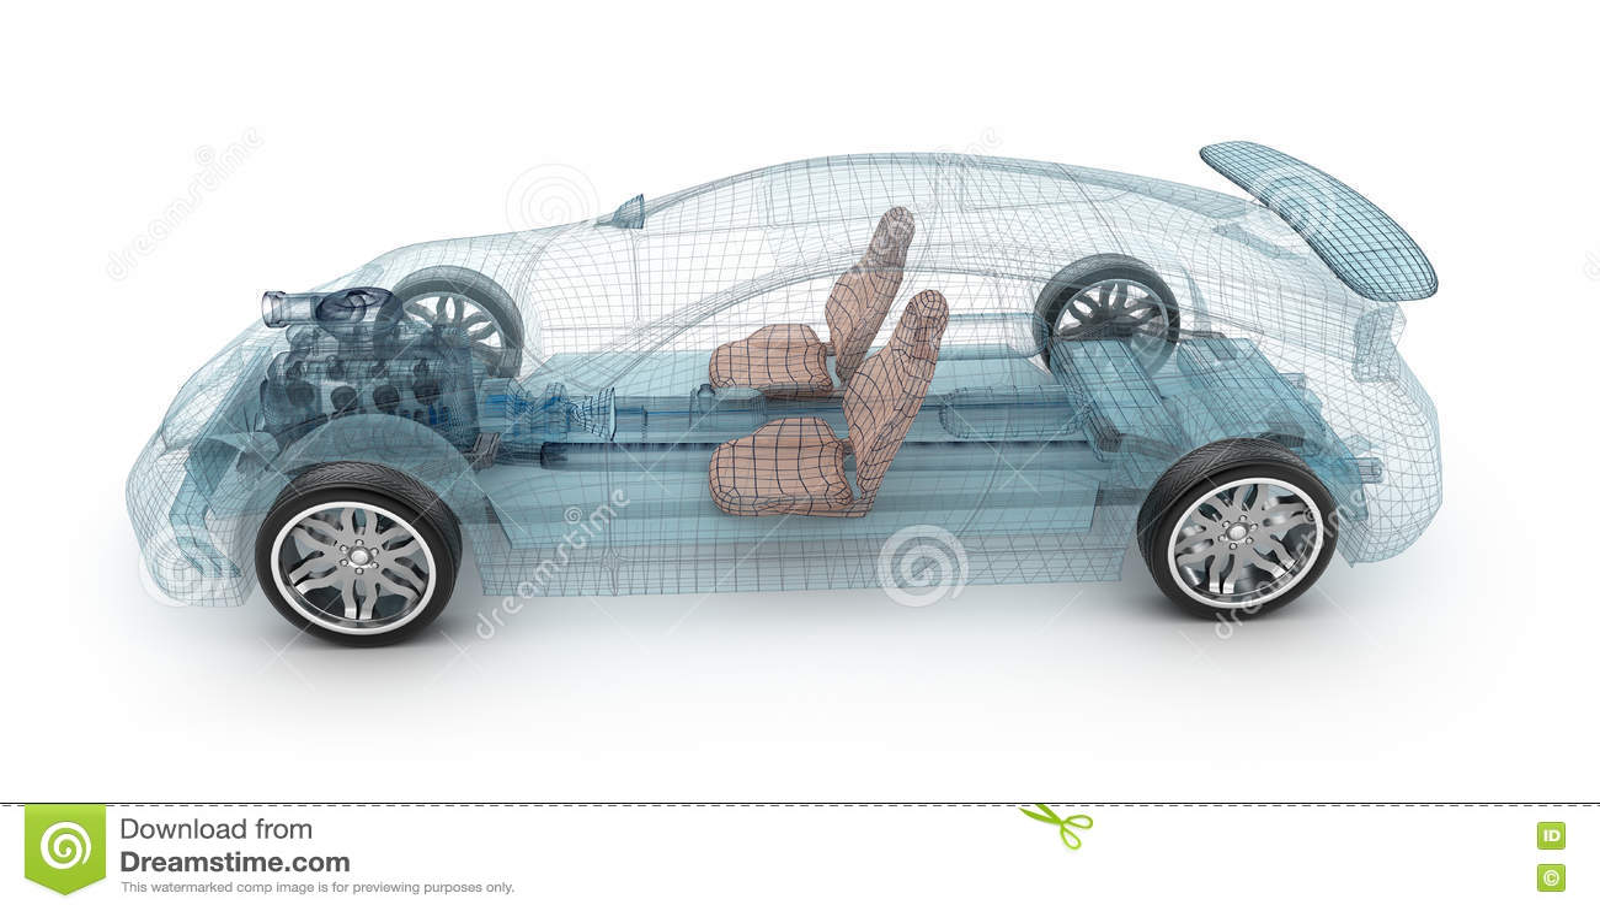 Ziemlich Drahtmodell 700 Ideen - Elektrische Schaltplan-Ideen ...